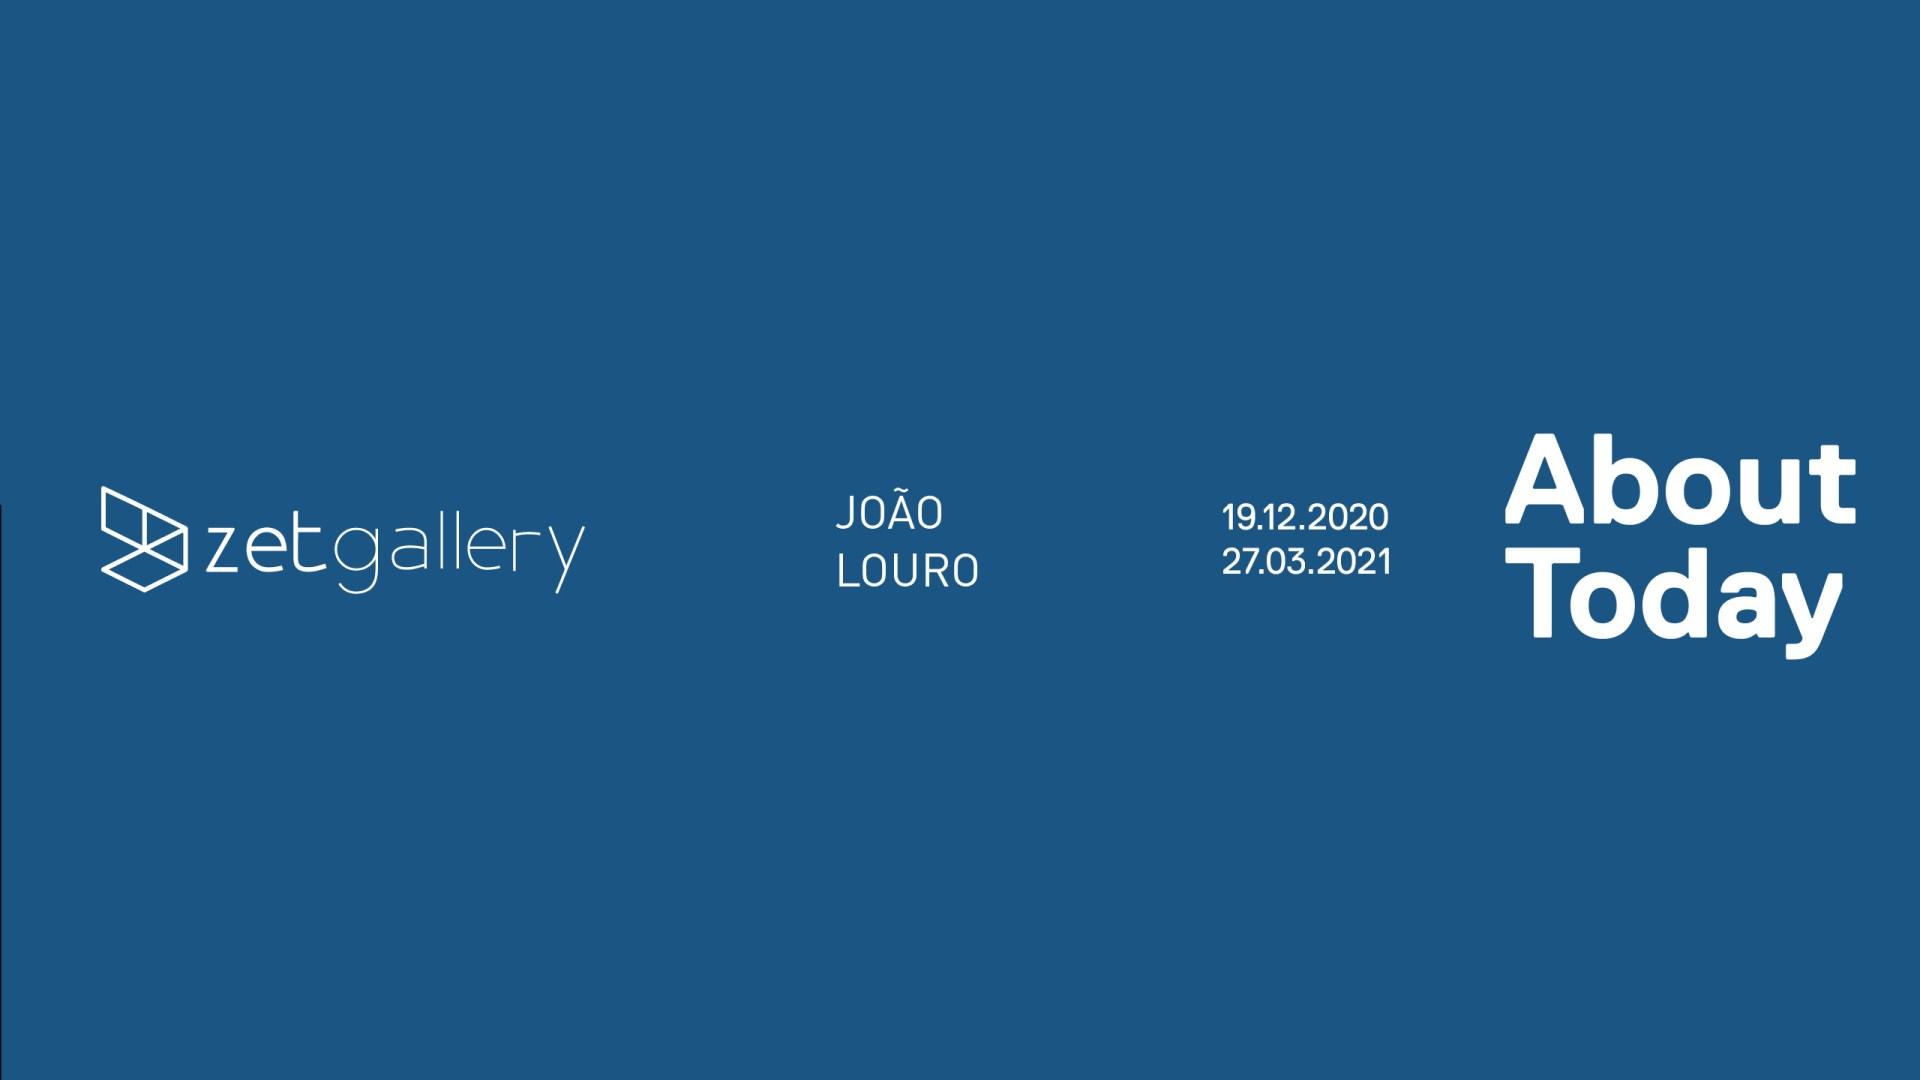 Interview with João Louro